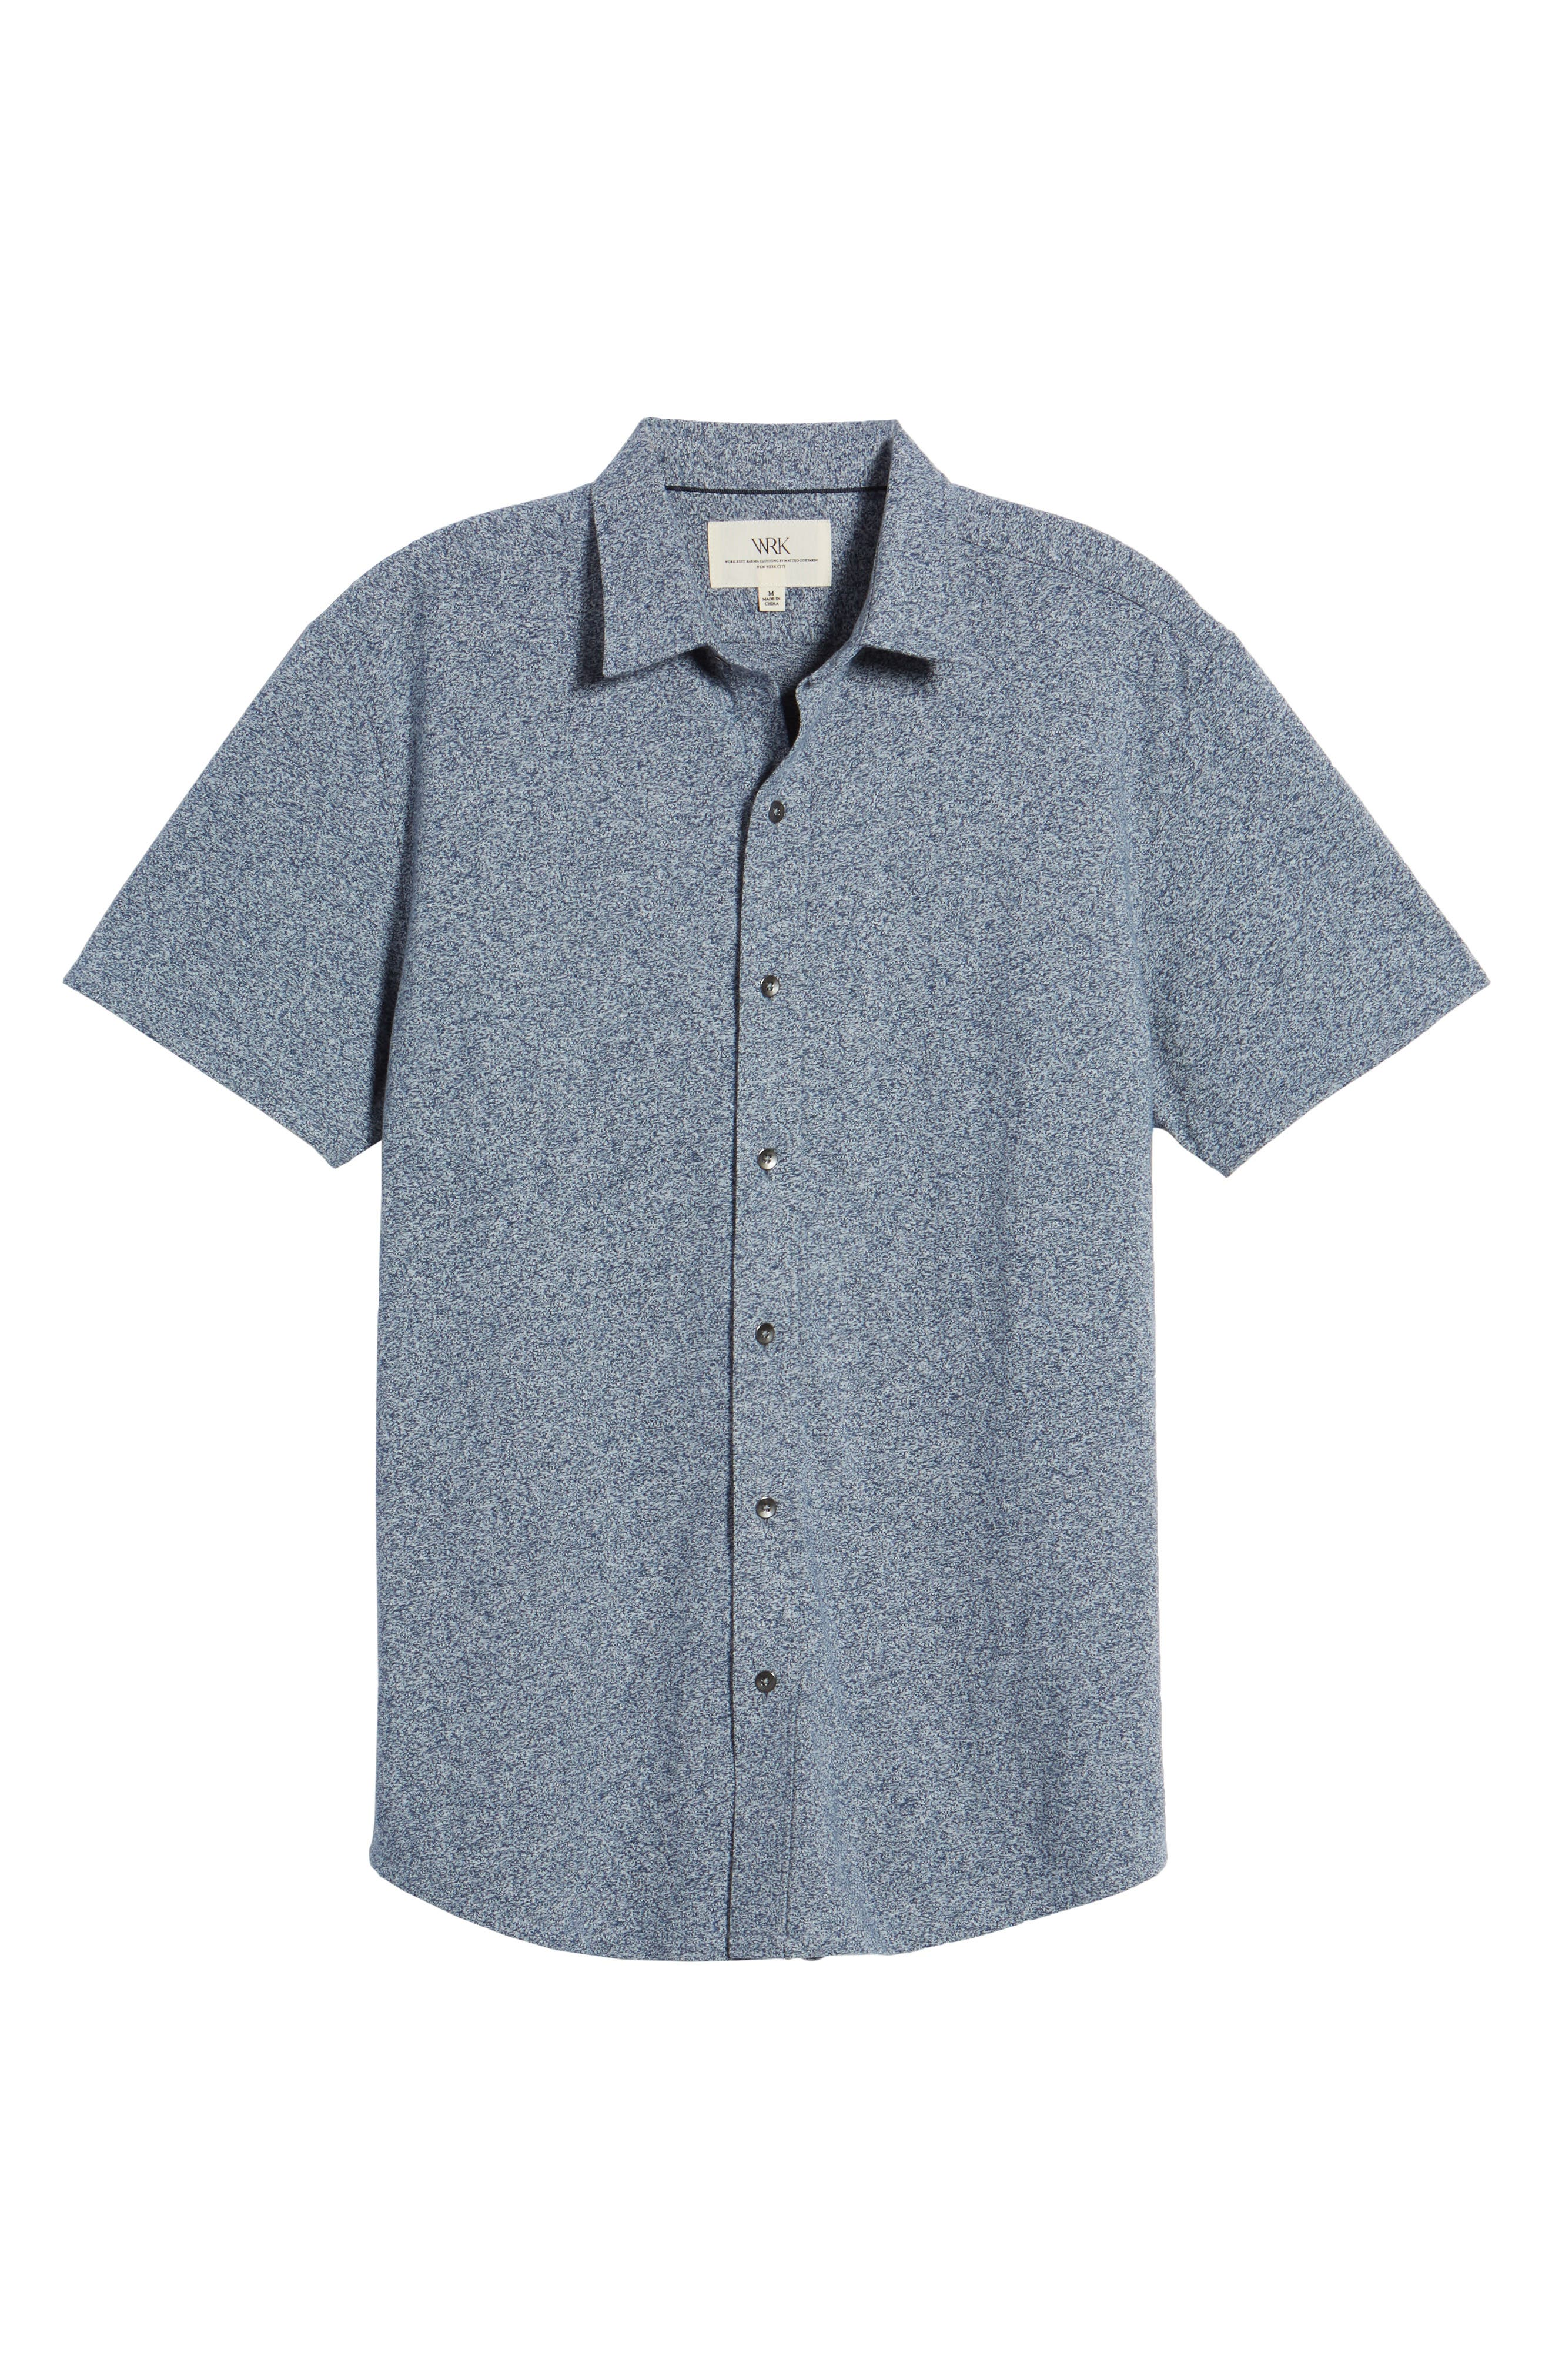 'Metropolitan' Knit Short Sleeve Sport Shirt,                             Alternate thumbnail 6, color,                             NAVY/ WHITE